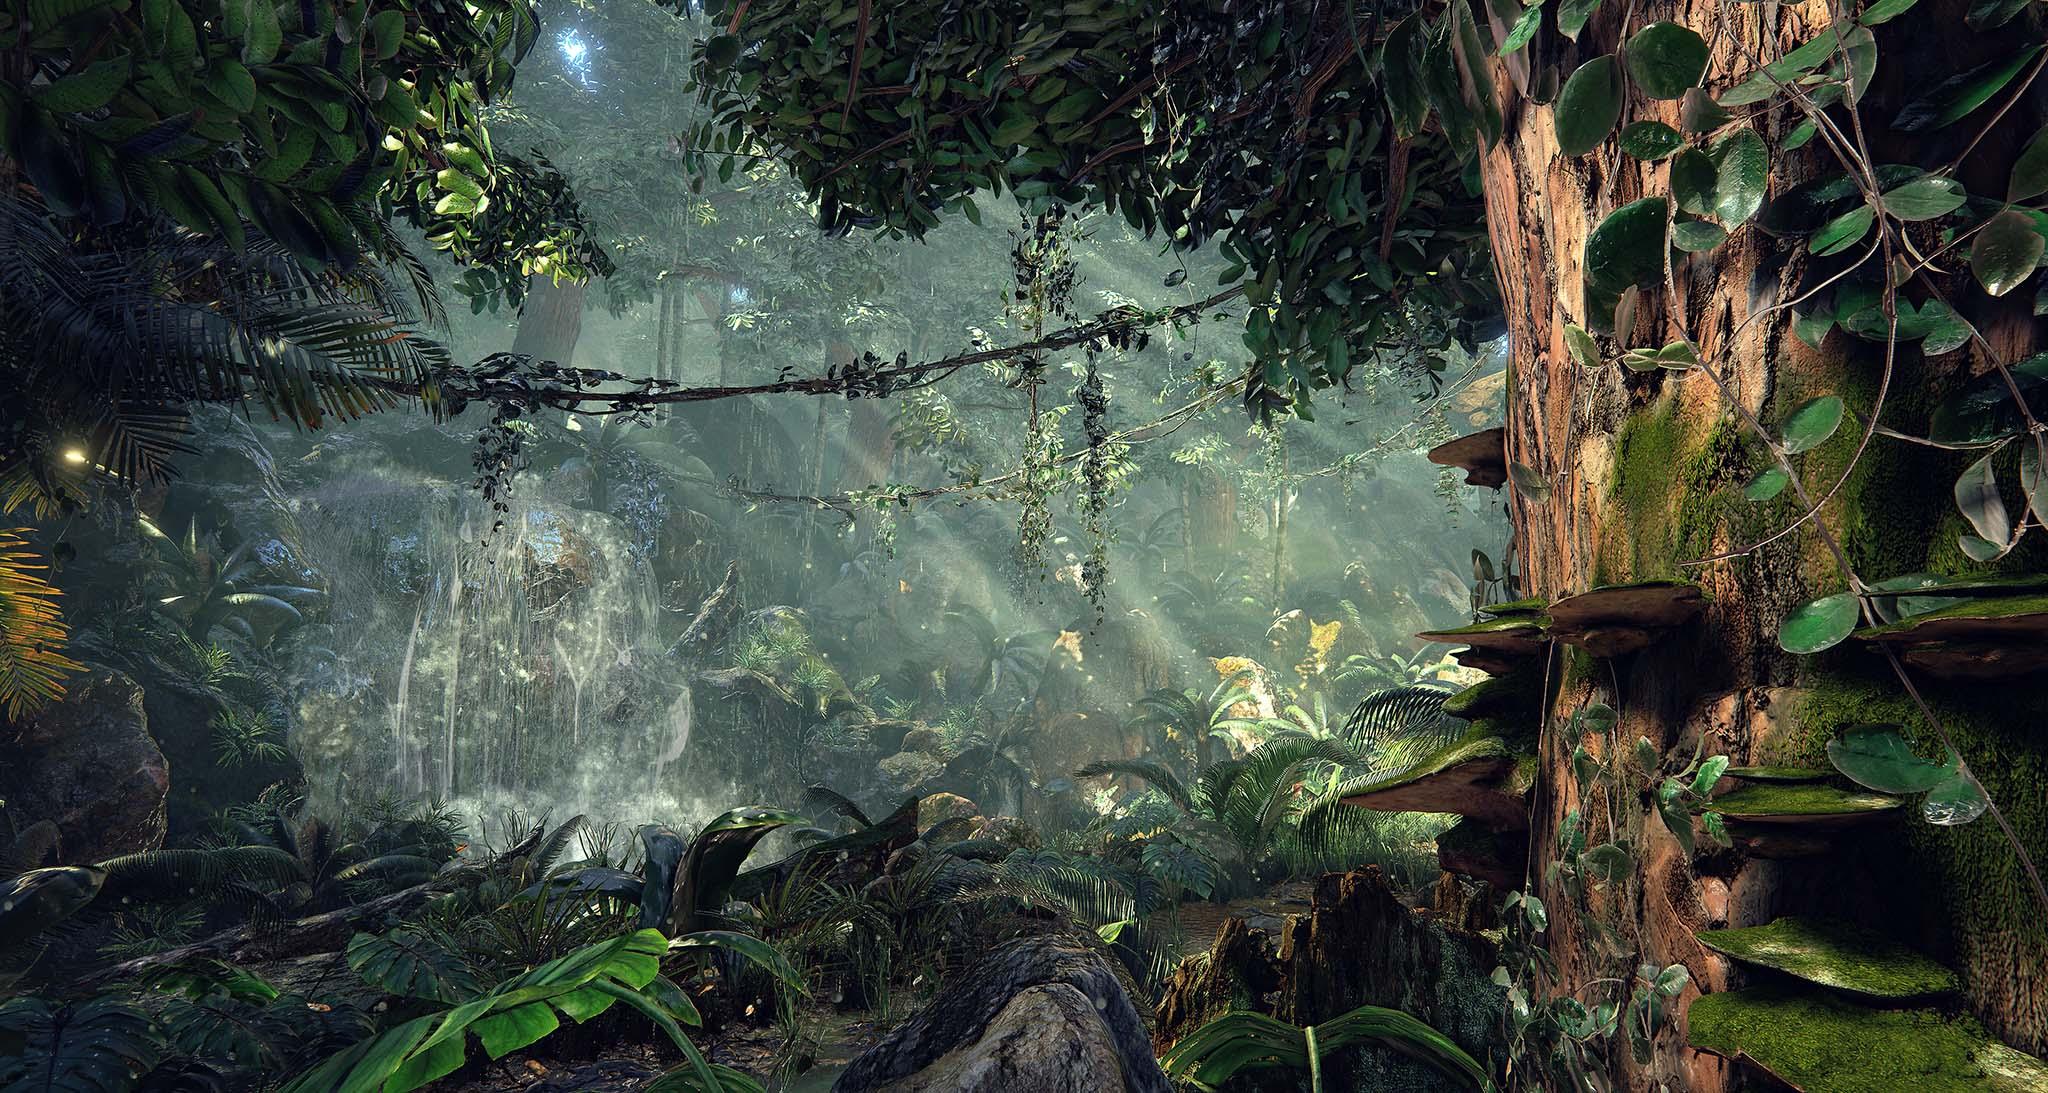 Unreal-Engine-4-Quixel's-Jungle-Environment-8